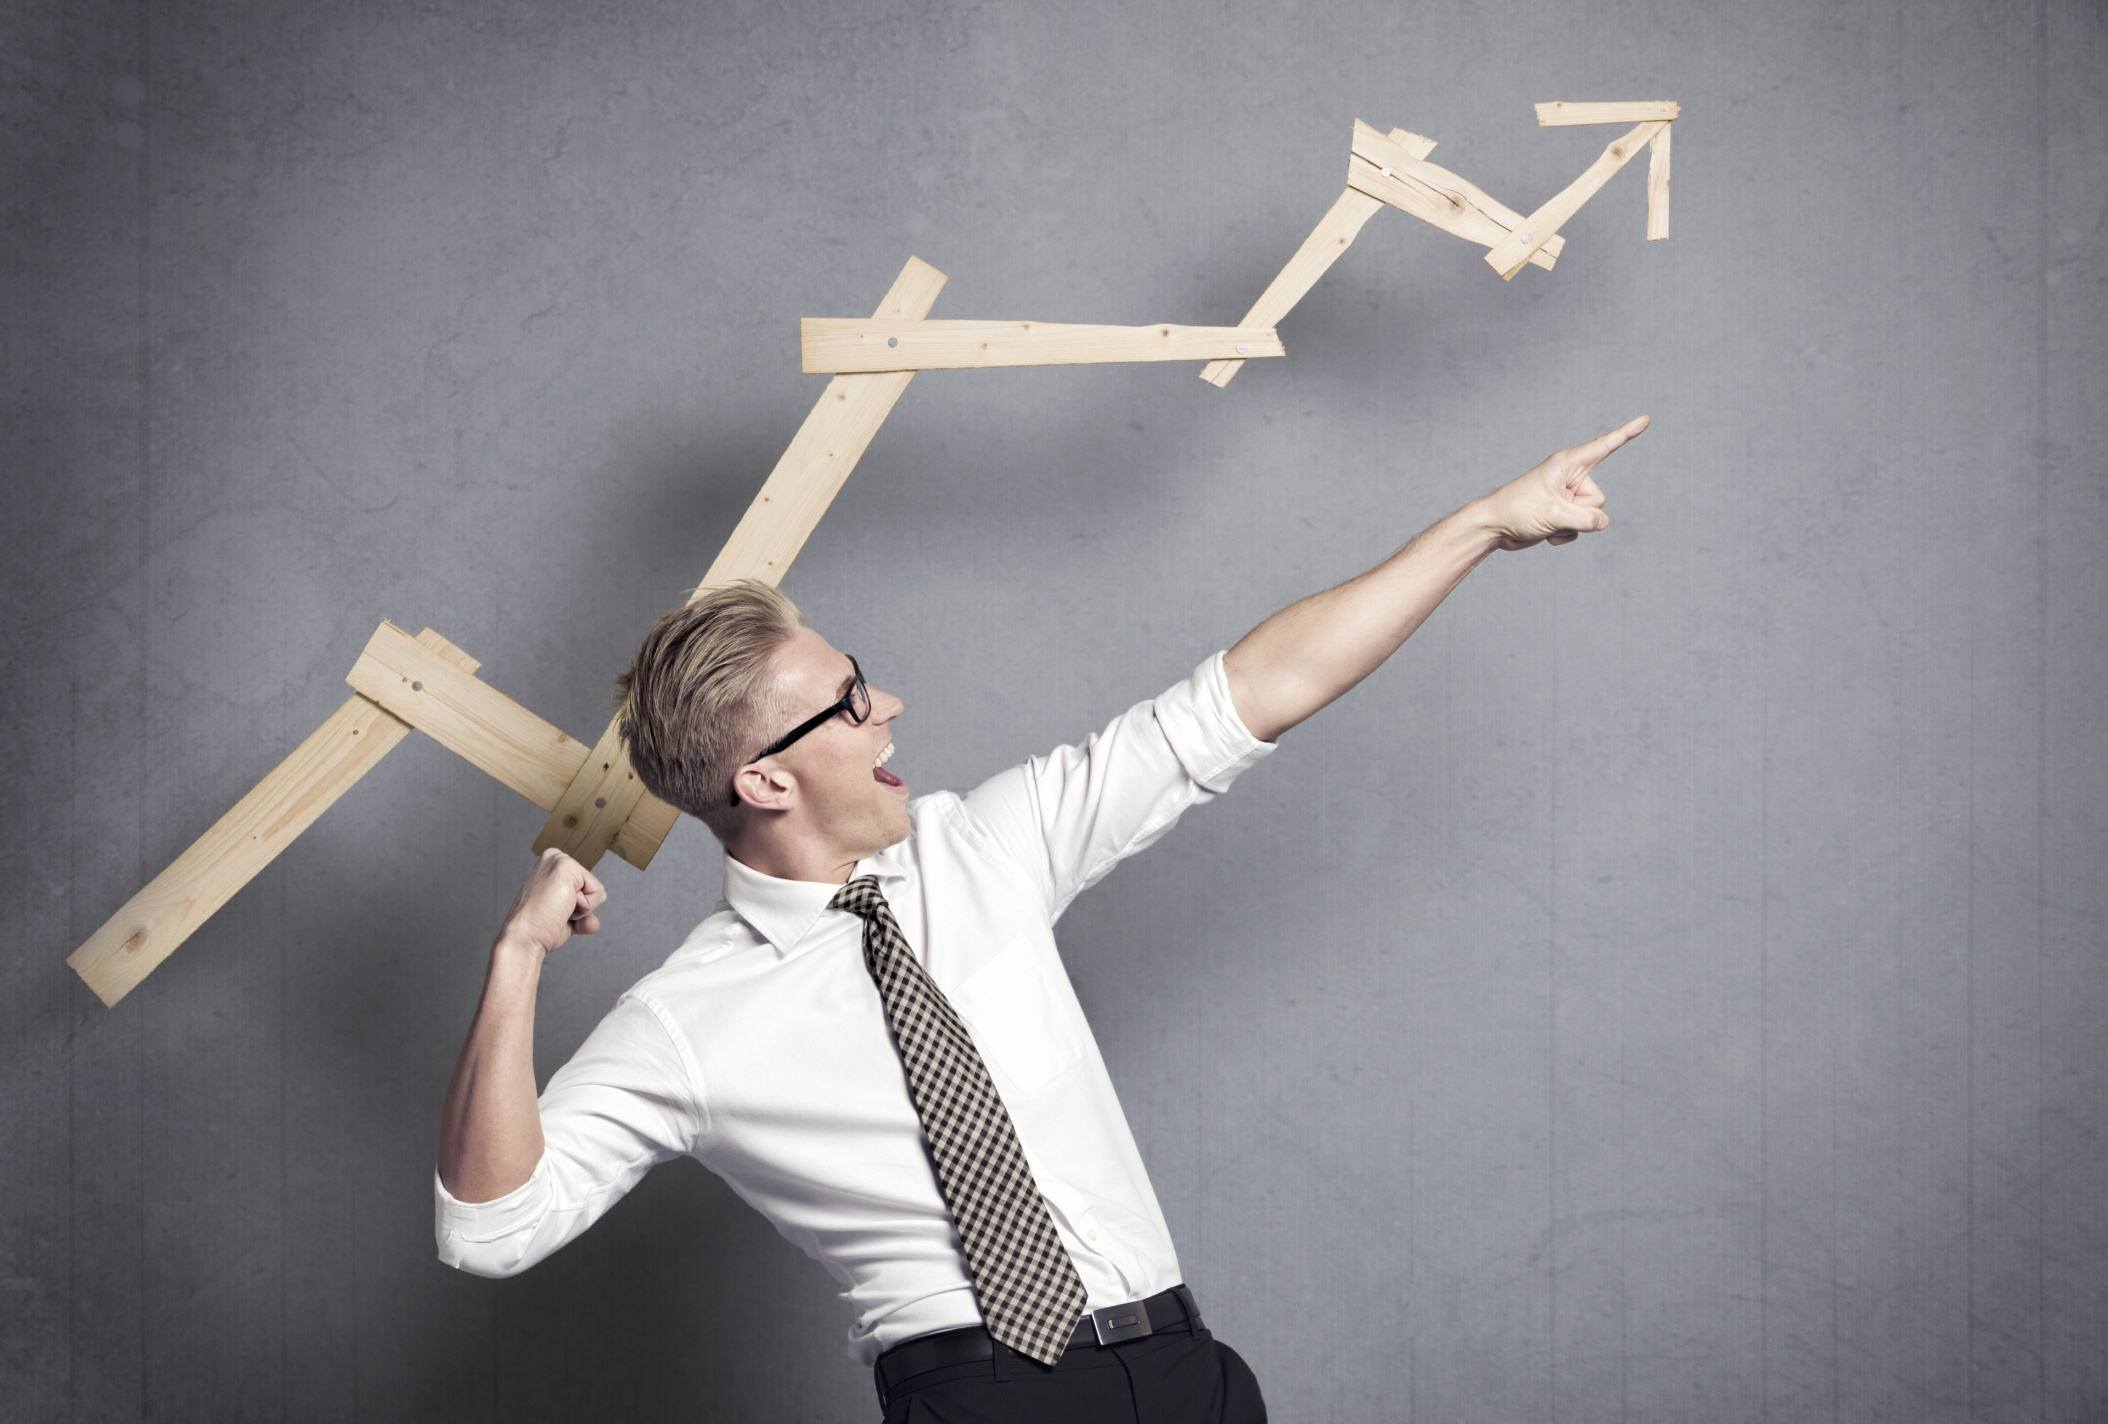 Faktor Kunci yang Membuat Seseorang Menjadi Pengusaha Sukses